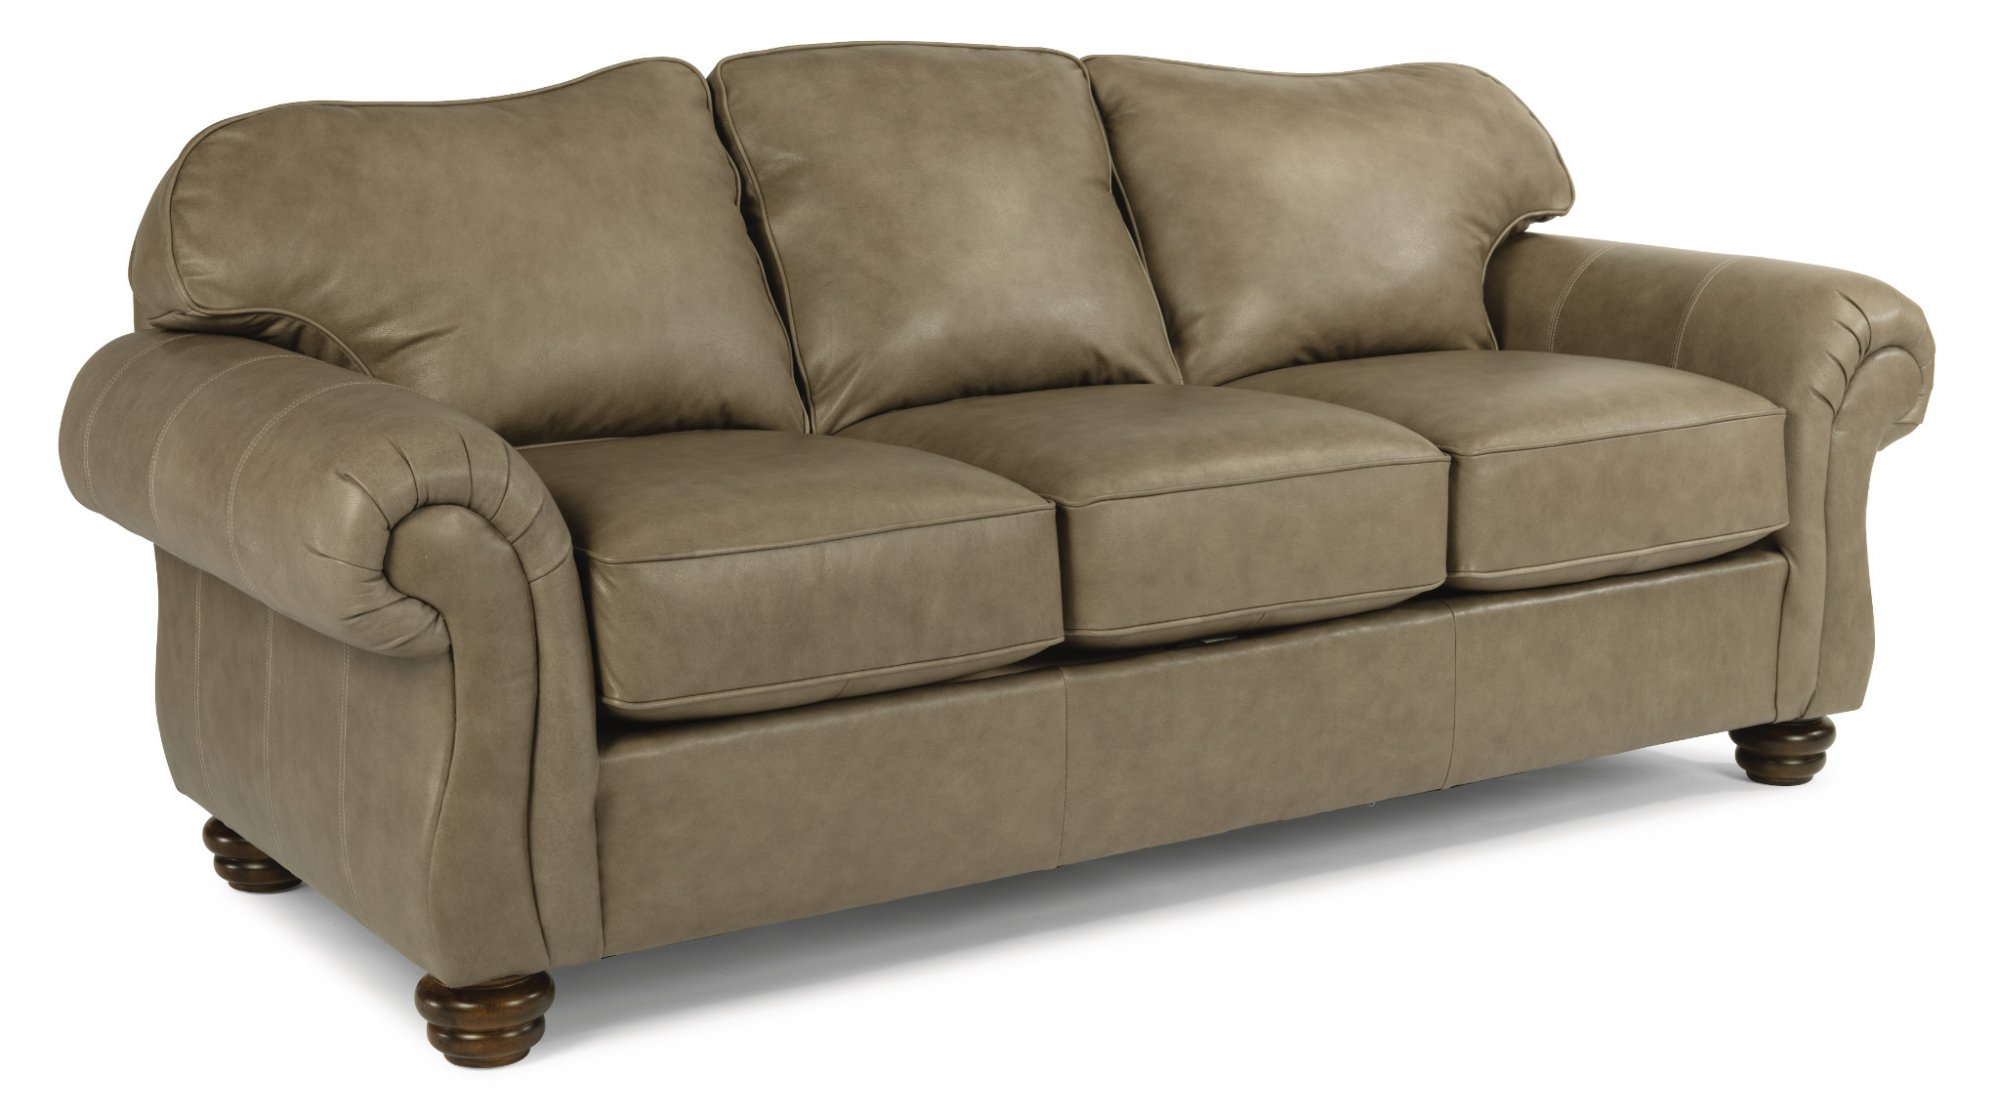 Flexsteel - 3646-31 - Bexley Leather Sofa without Nailhead ...